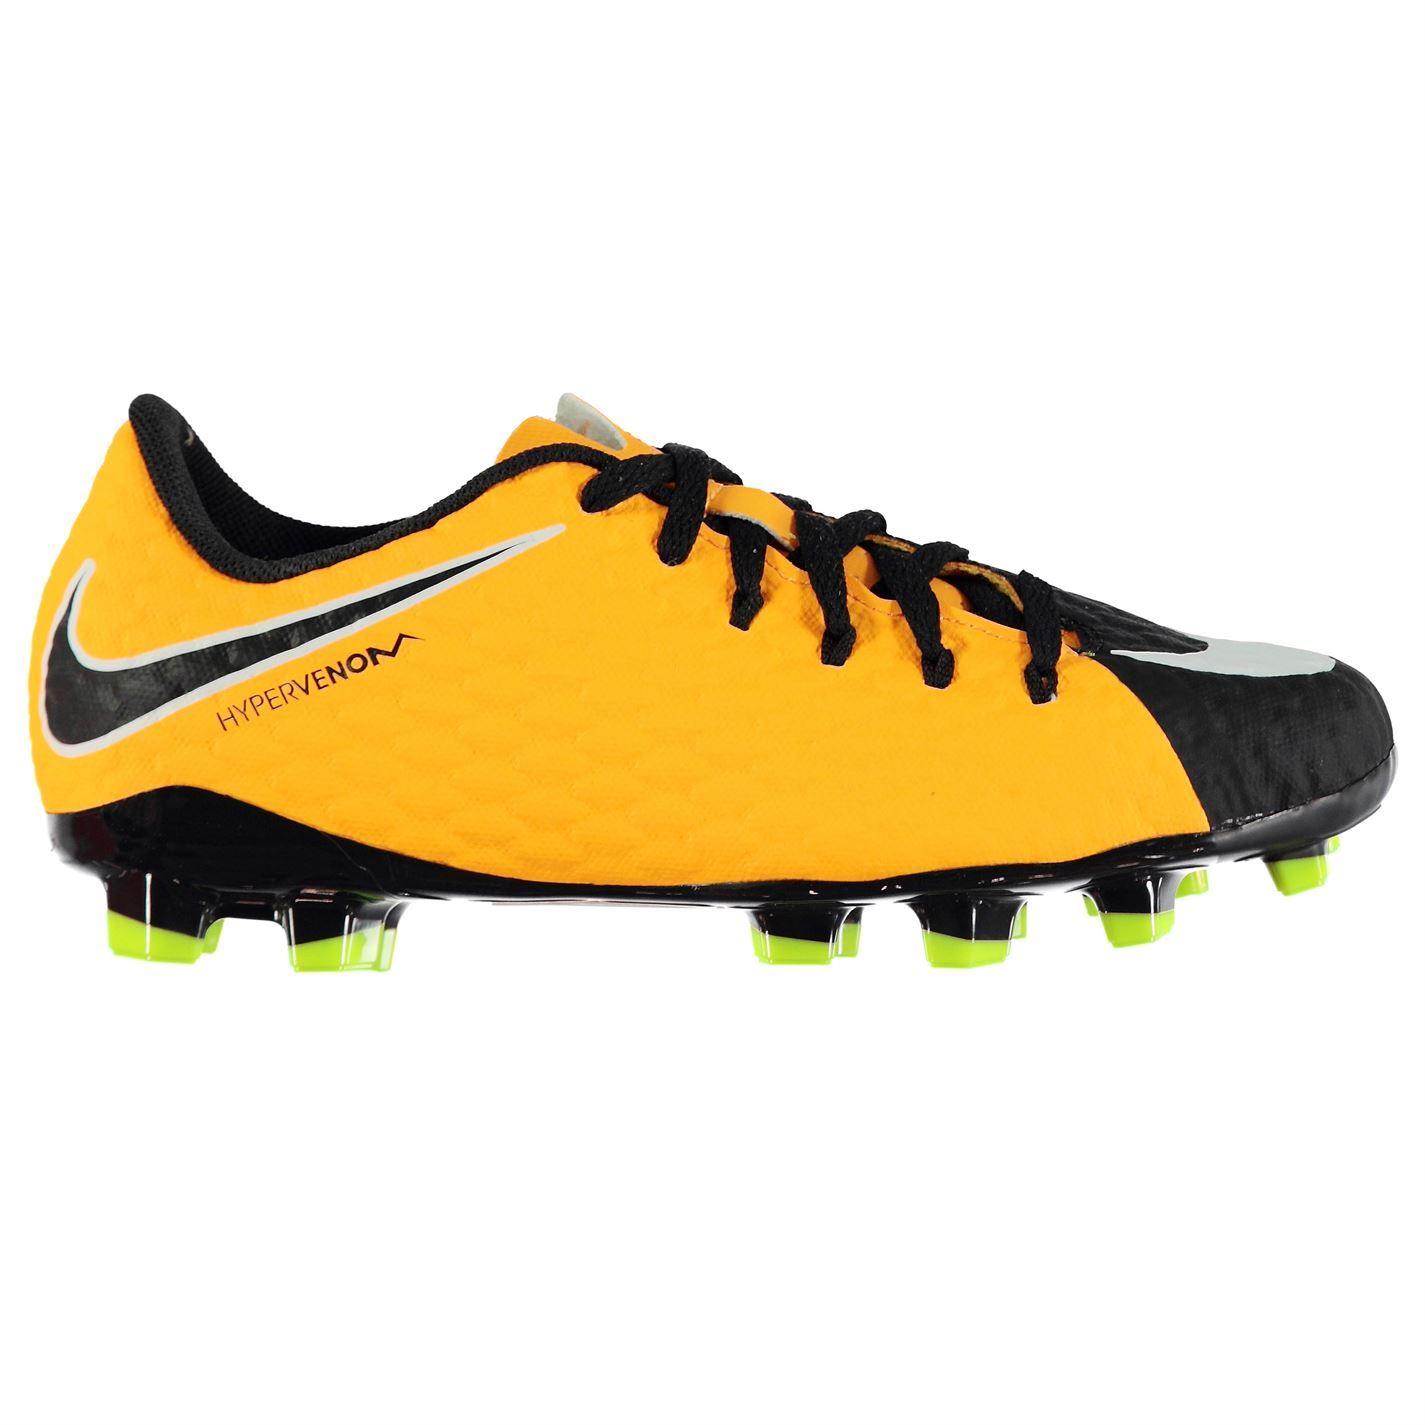 899d32a3392c ... Nike Hypervenom Phelon 3 Firm Ground Football Boots Juniors Orange  Soccer Cleats ...